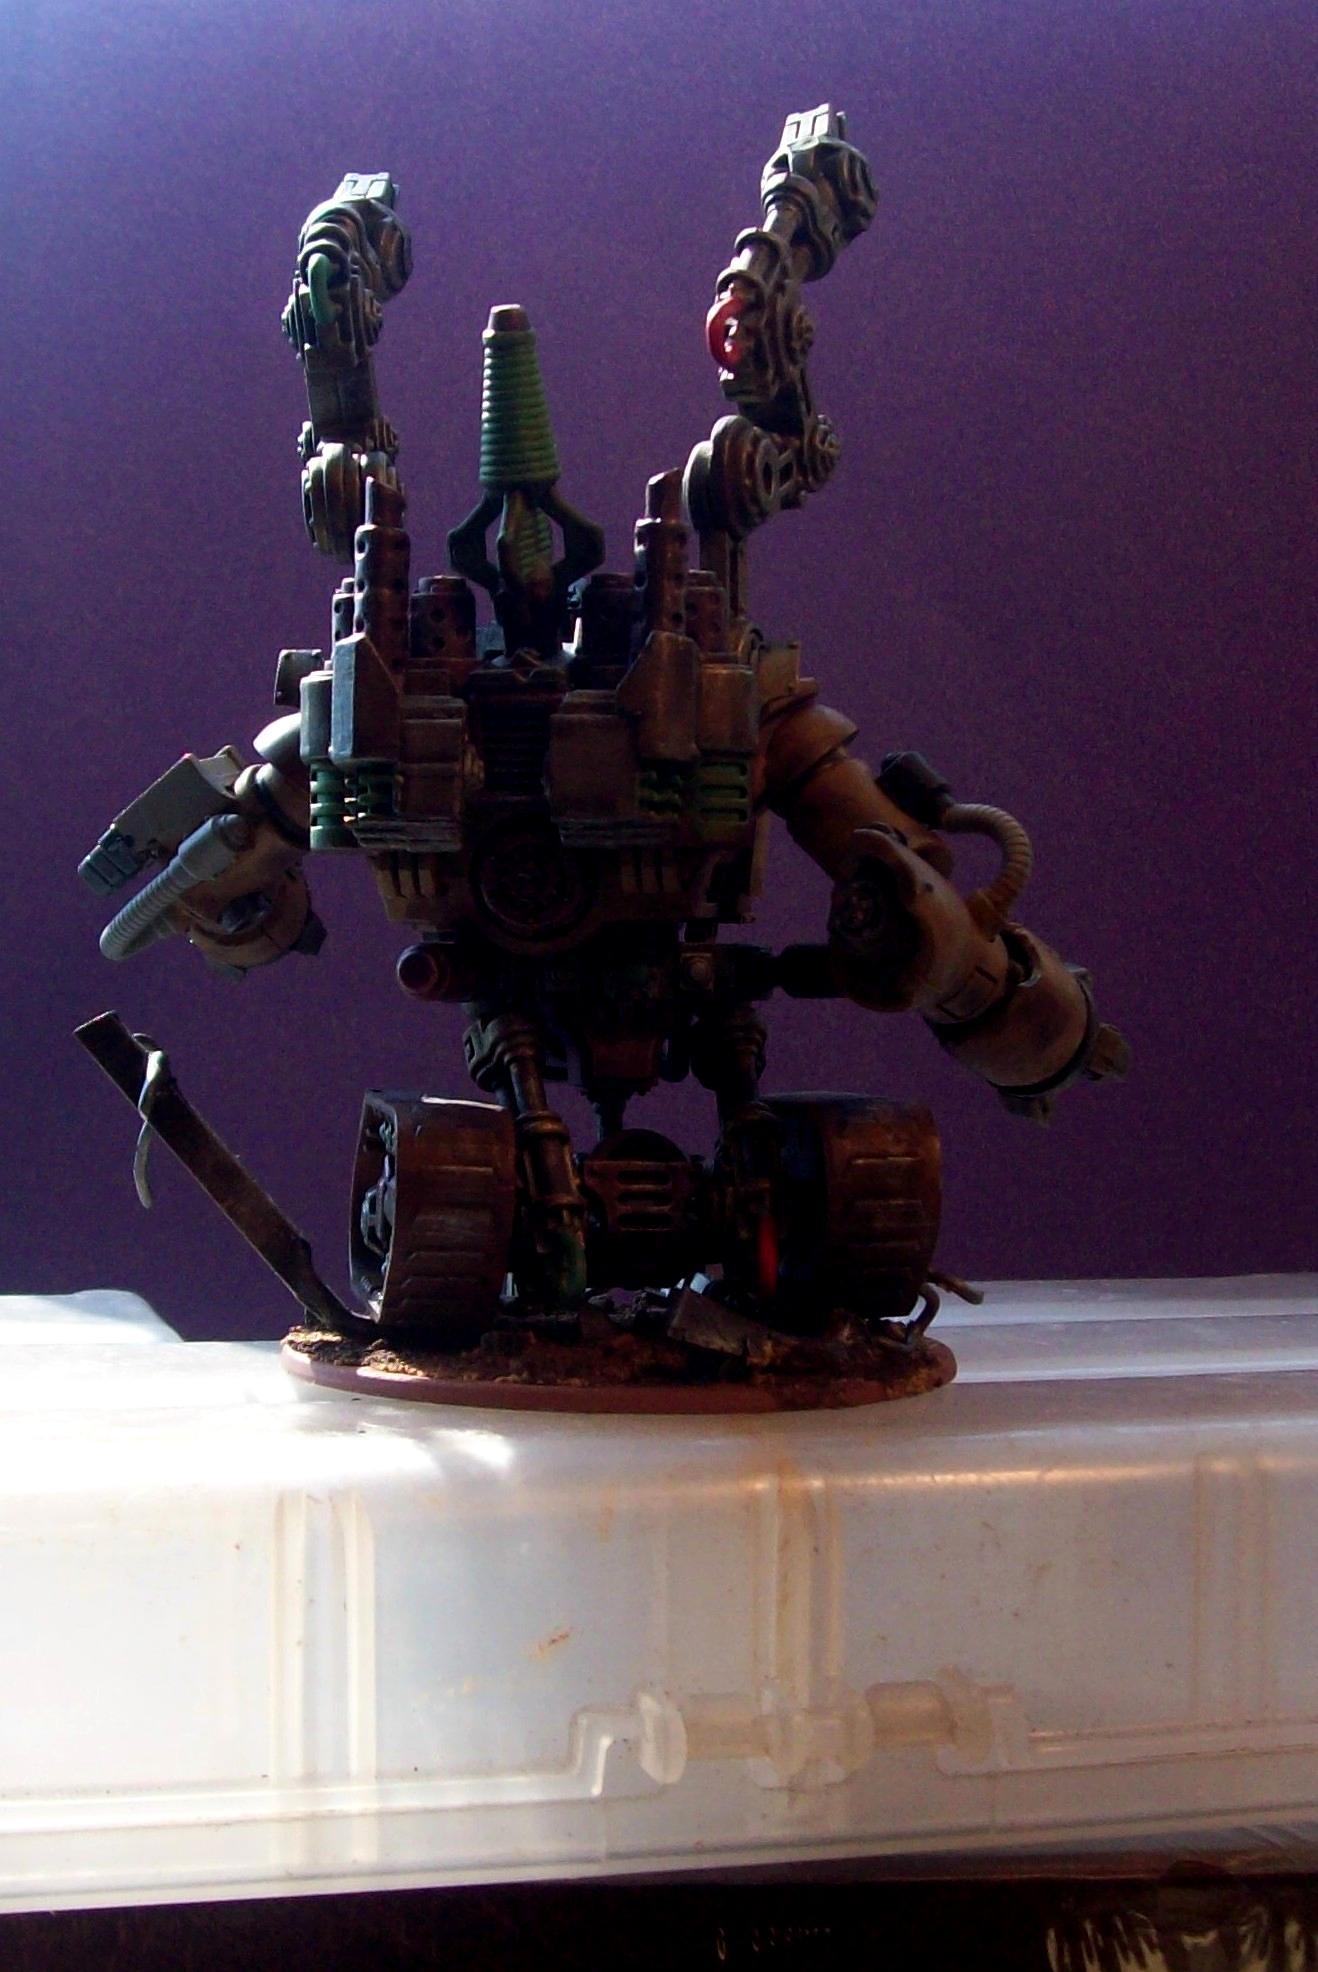 Dreadnought, Nifty, Servo Arms, Tracks, Treads